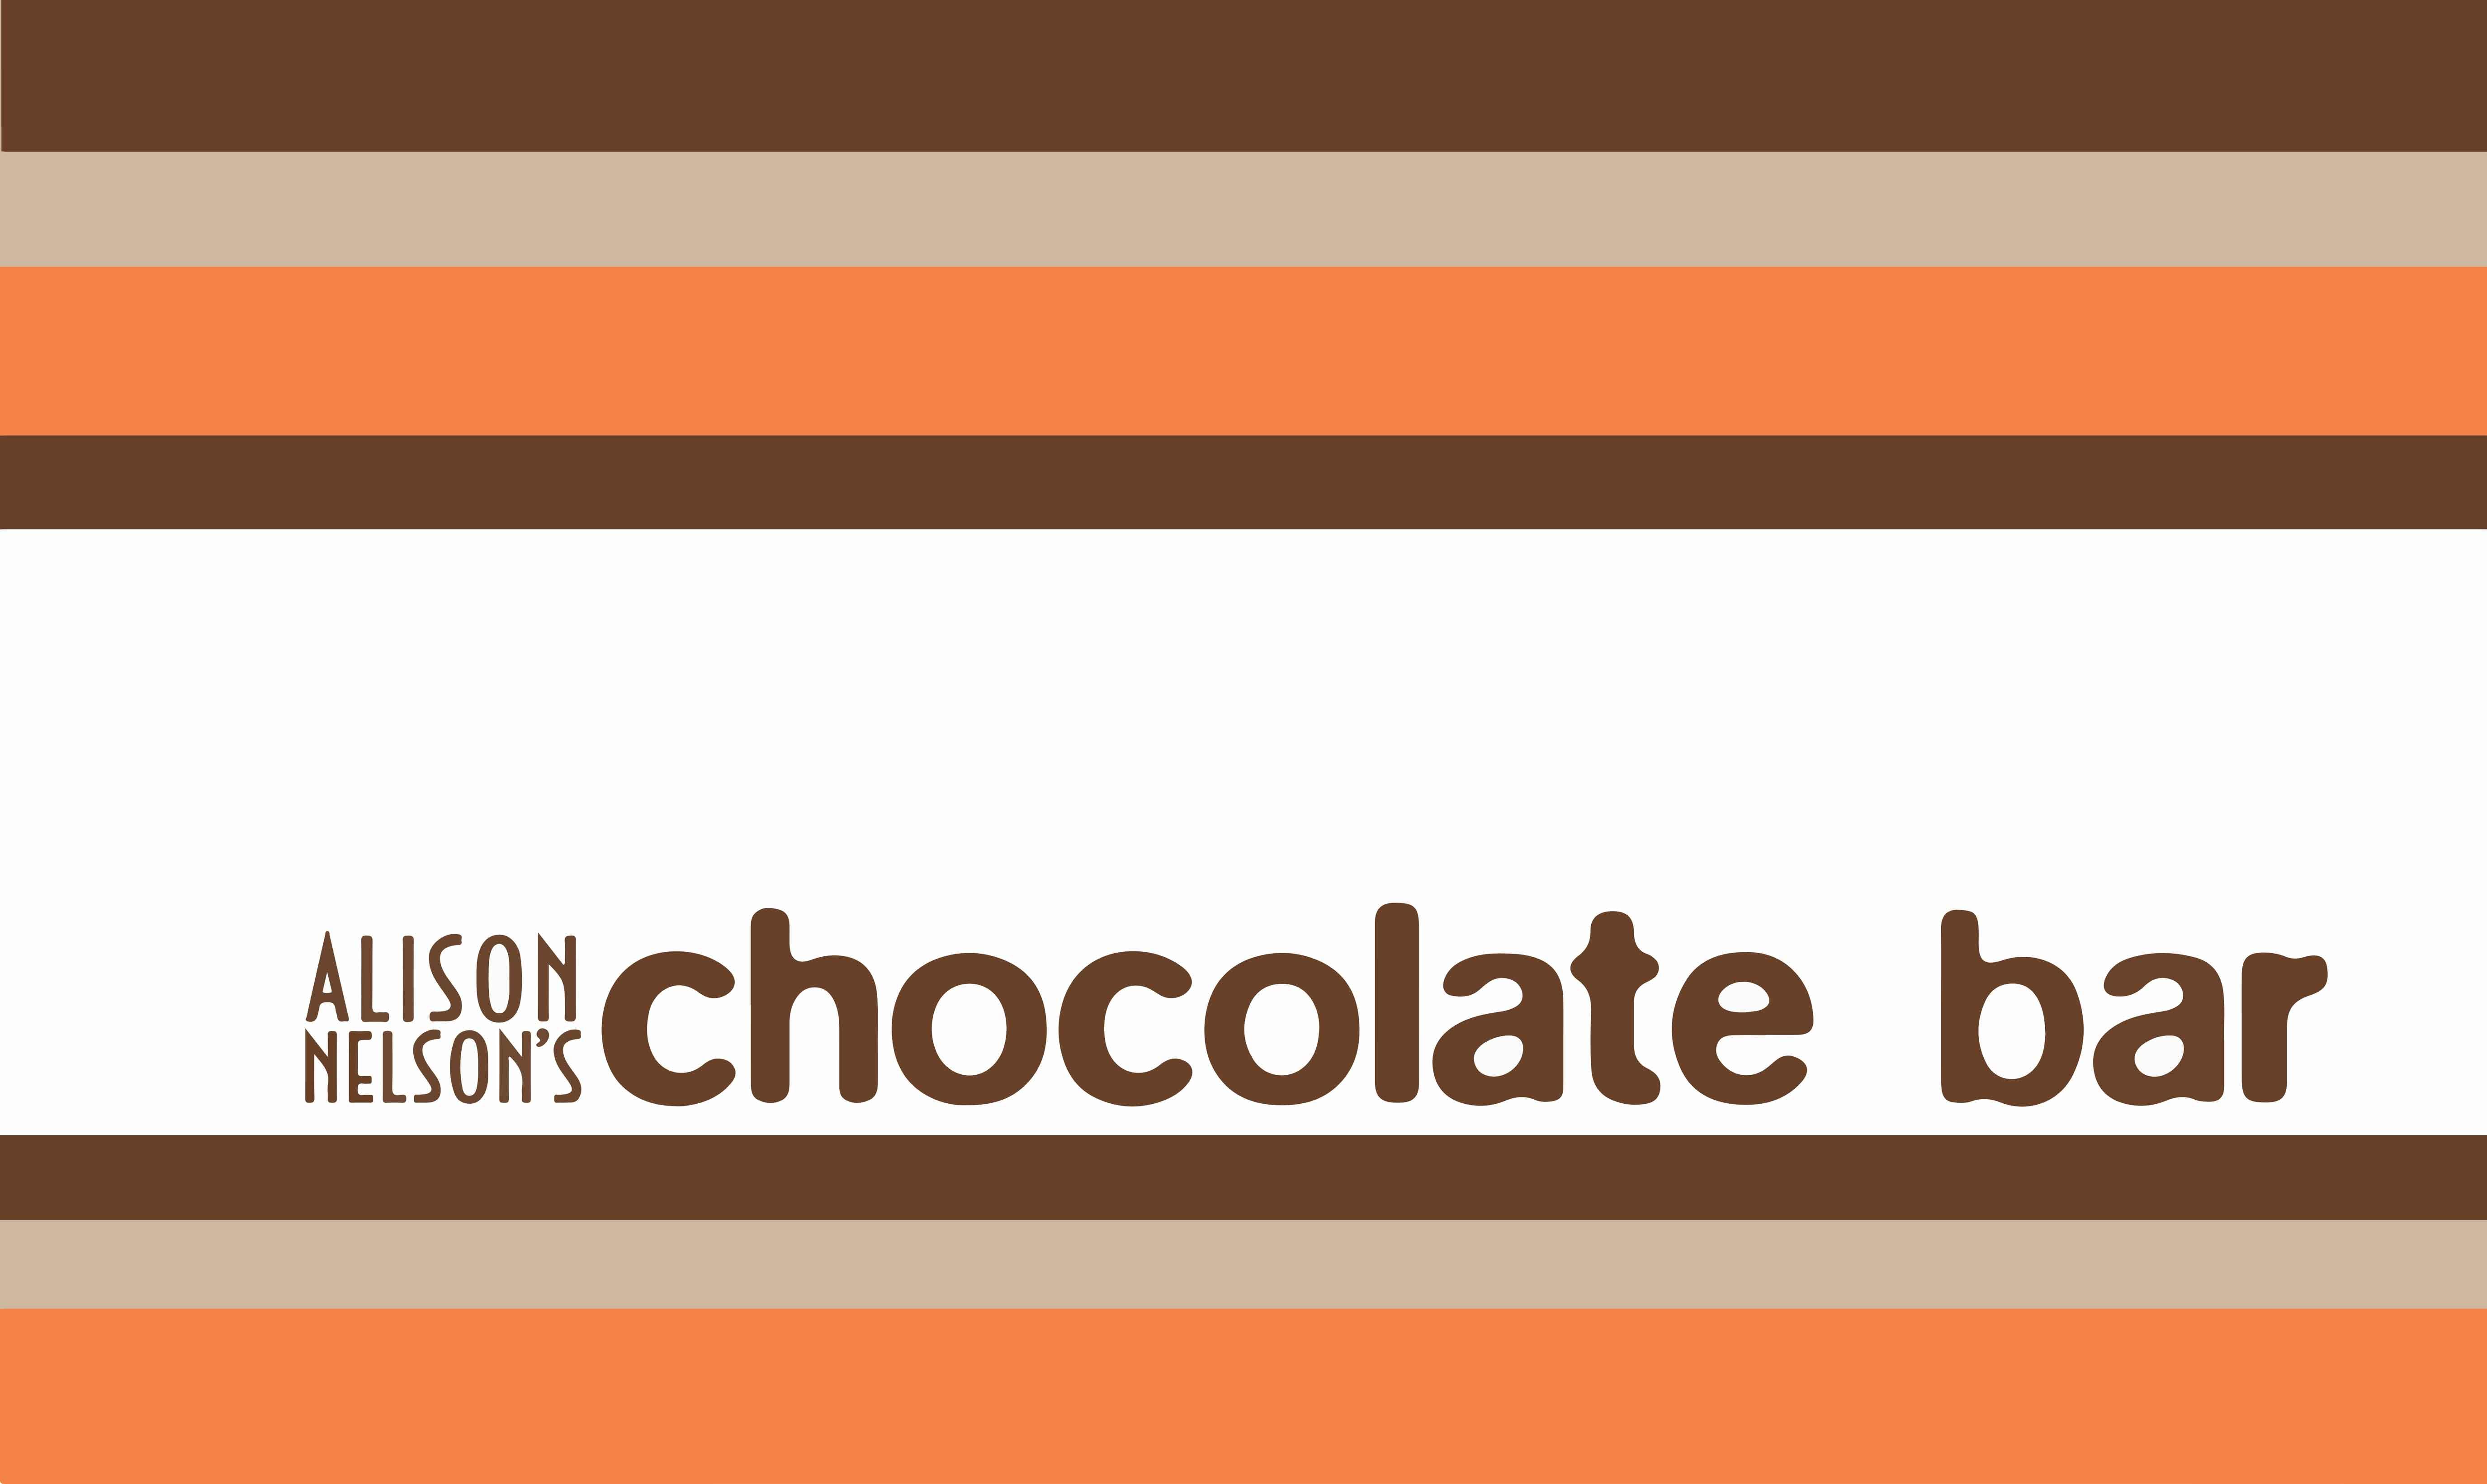 Alison Nelson's Chocolatet Bar